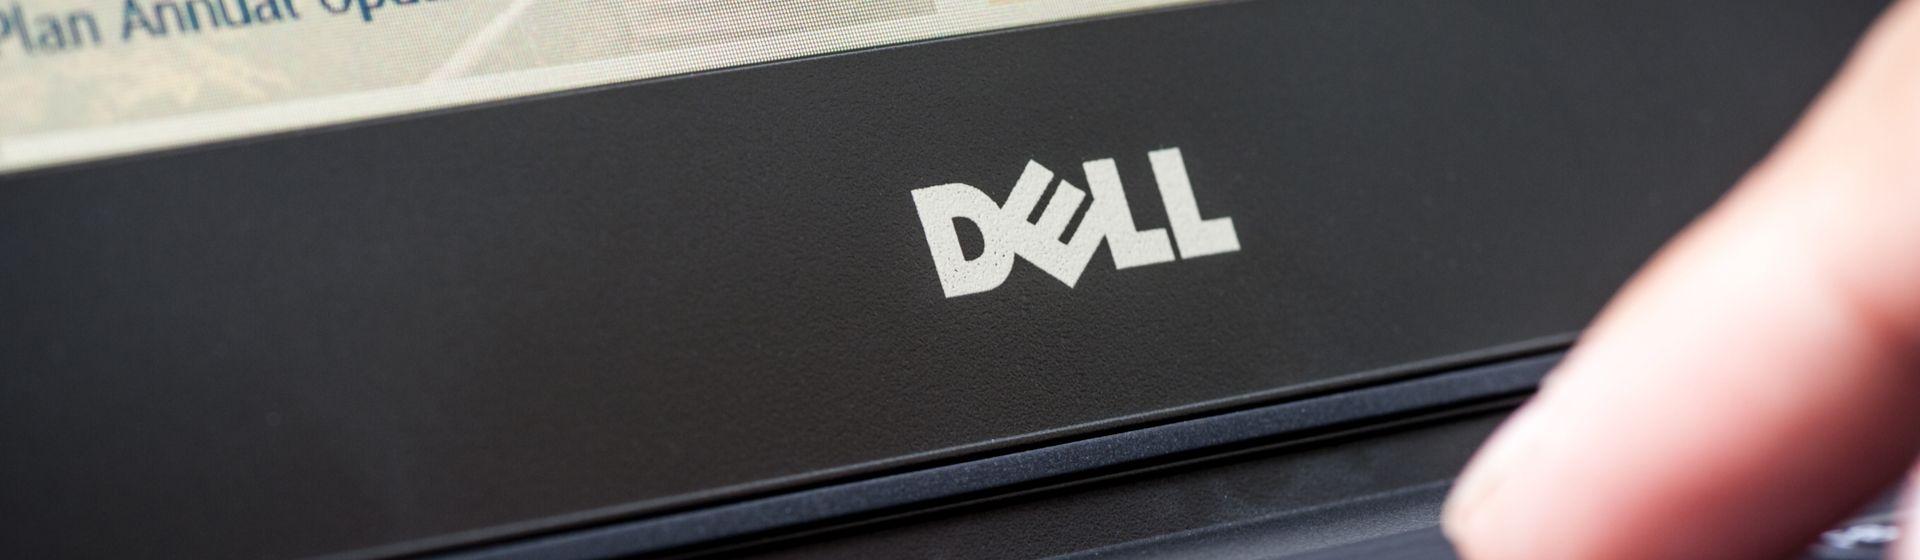 Dell XPS 13 2020: modelos e preços dos notebooks no Brasil